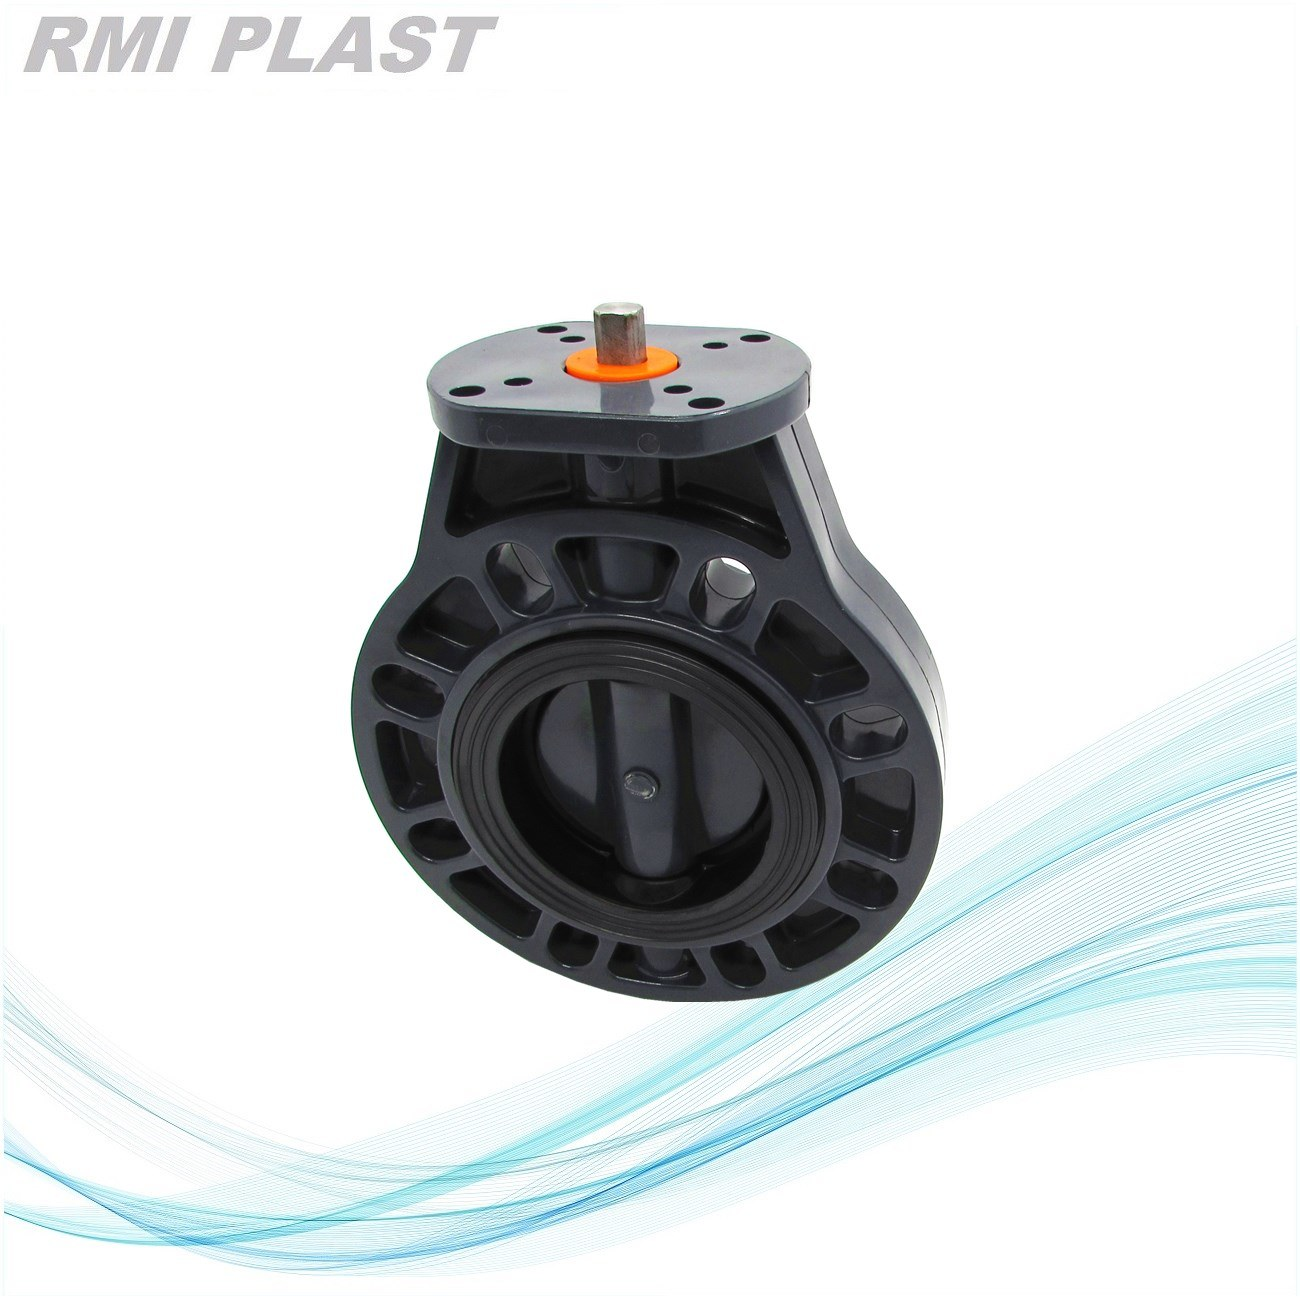 CPVC Pph PVDF PVC Plastic Pneumatic Butterfly Valve